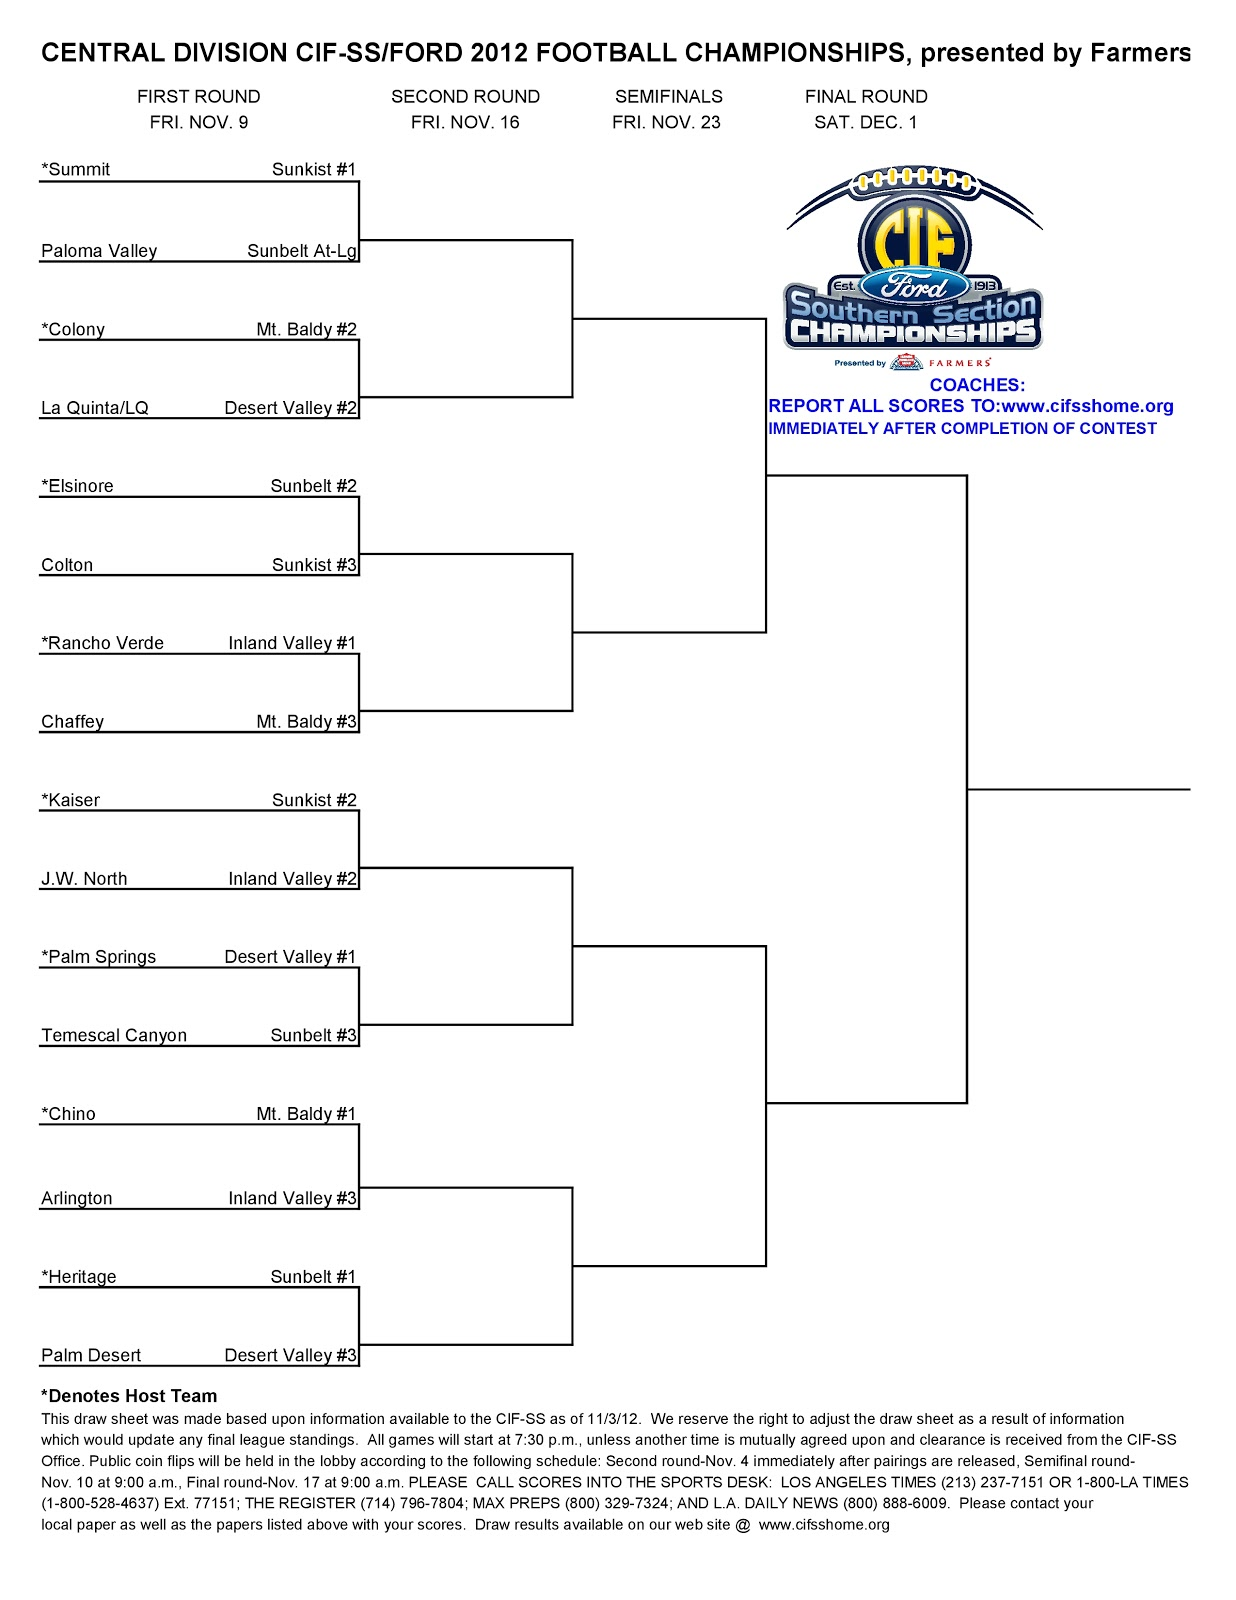 2014 division ii, division iii, and naia football playoff bracket